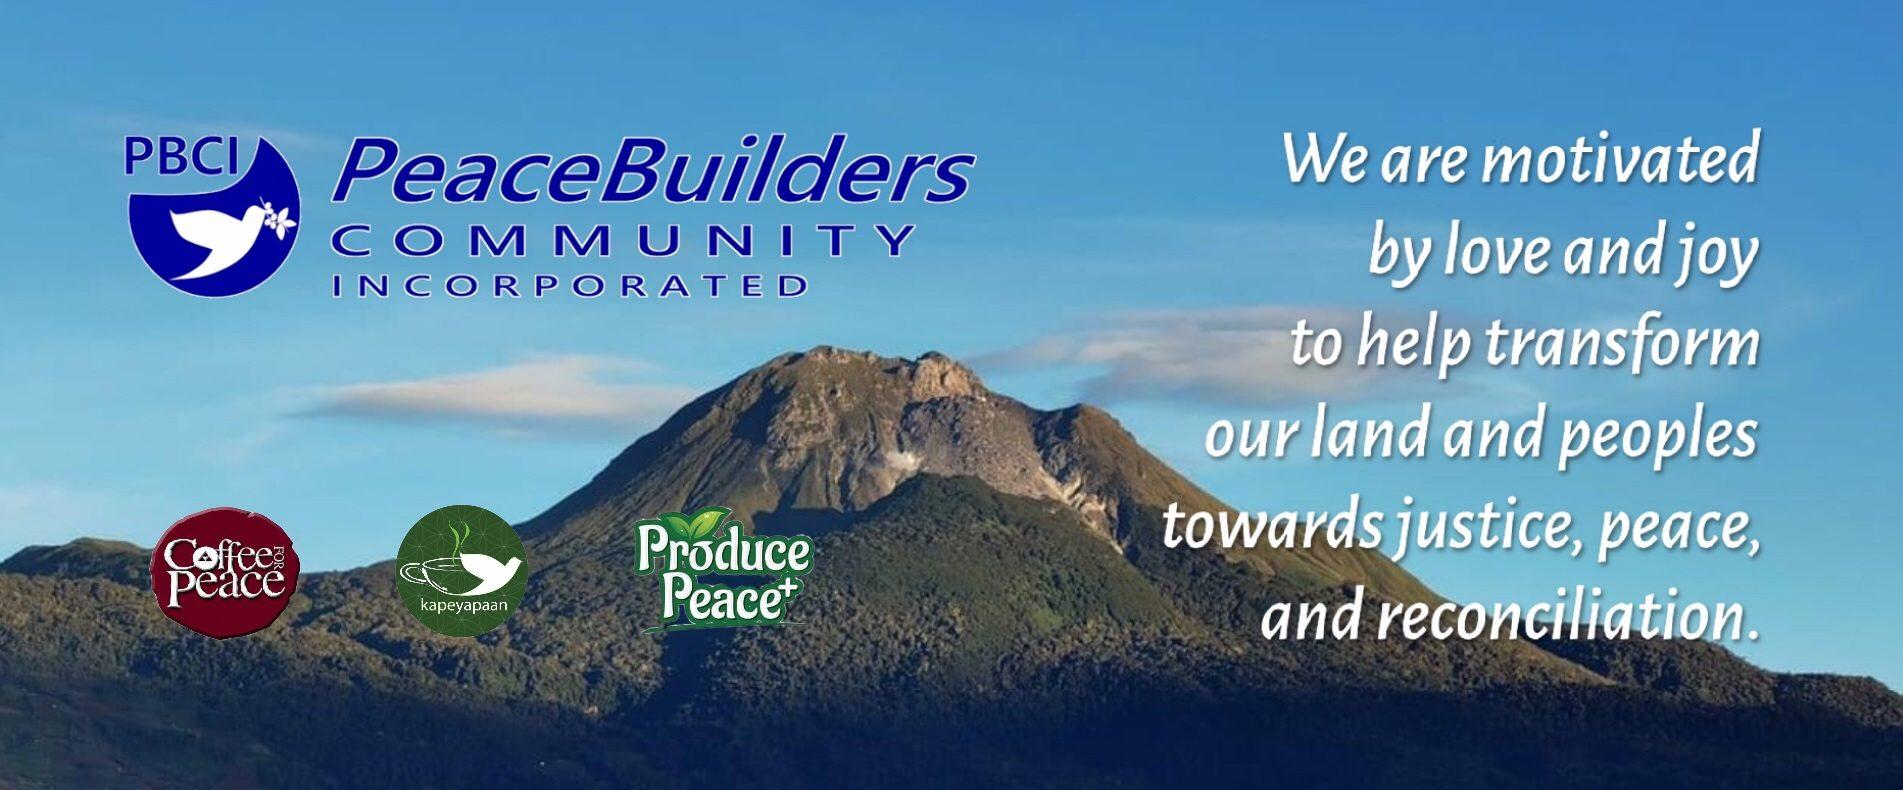 PeaceBuilders Community, Inc.